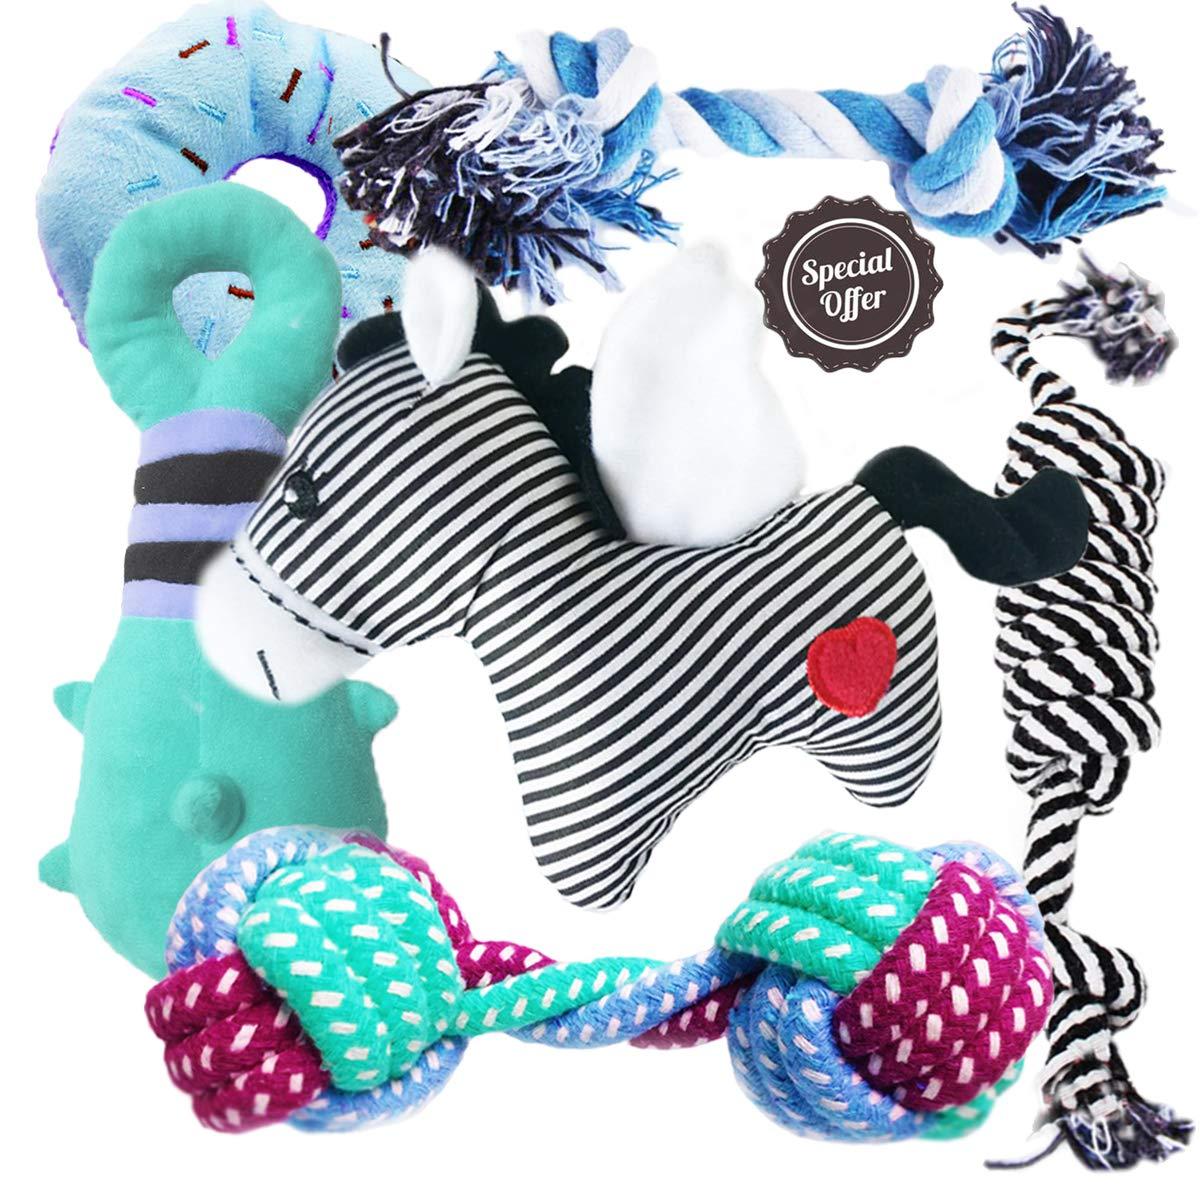 BUIBIIU Dog Toys, Dog Teething Toys Best Puppy Chew Toys Dog Chew Toys Squeaky Toys Balls by BUIBIIU